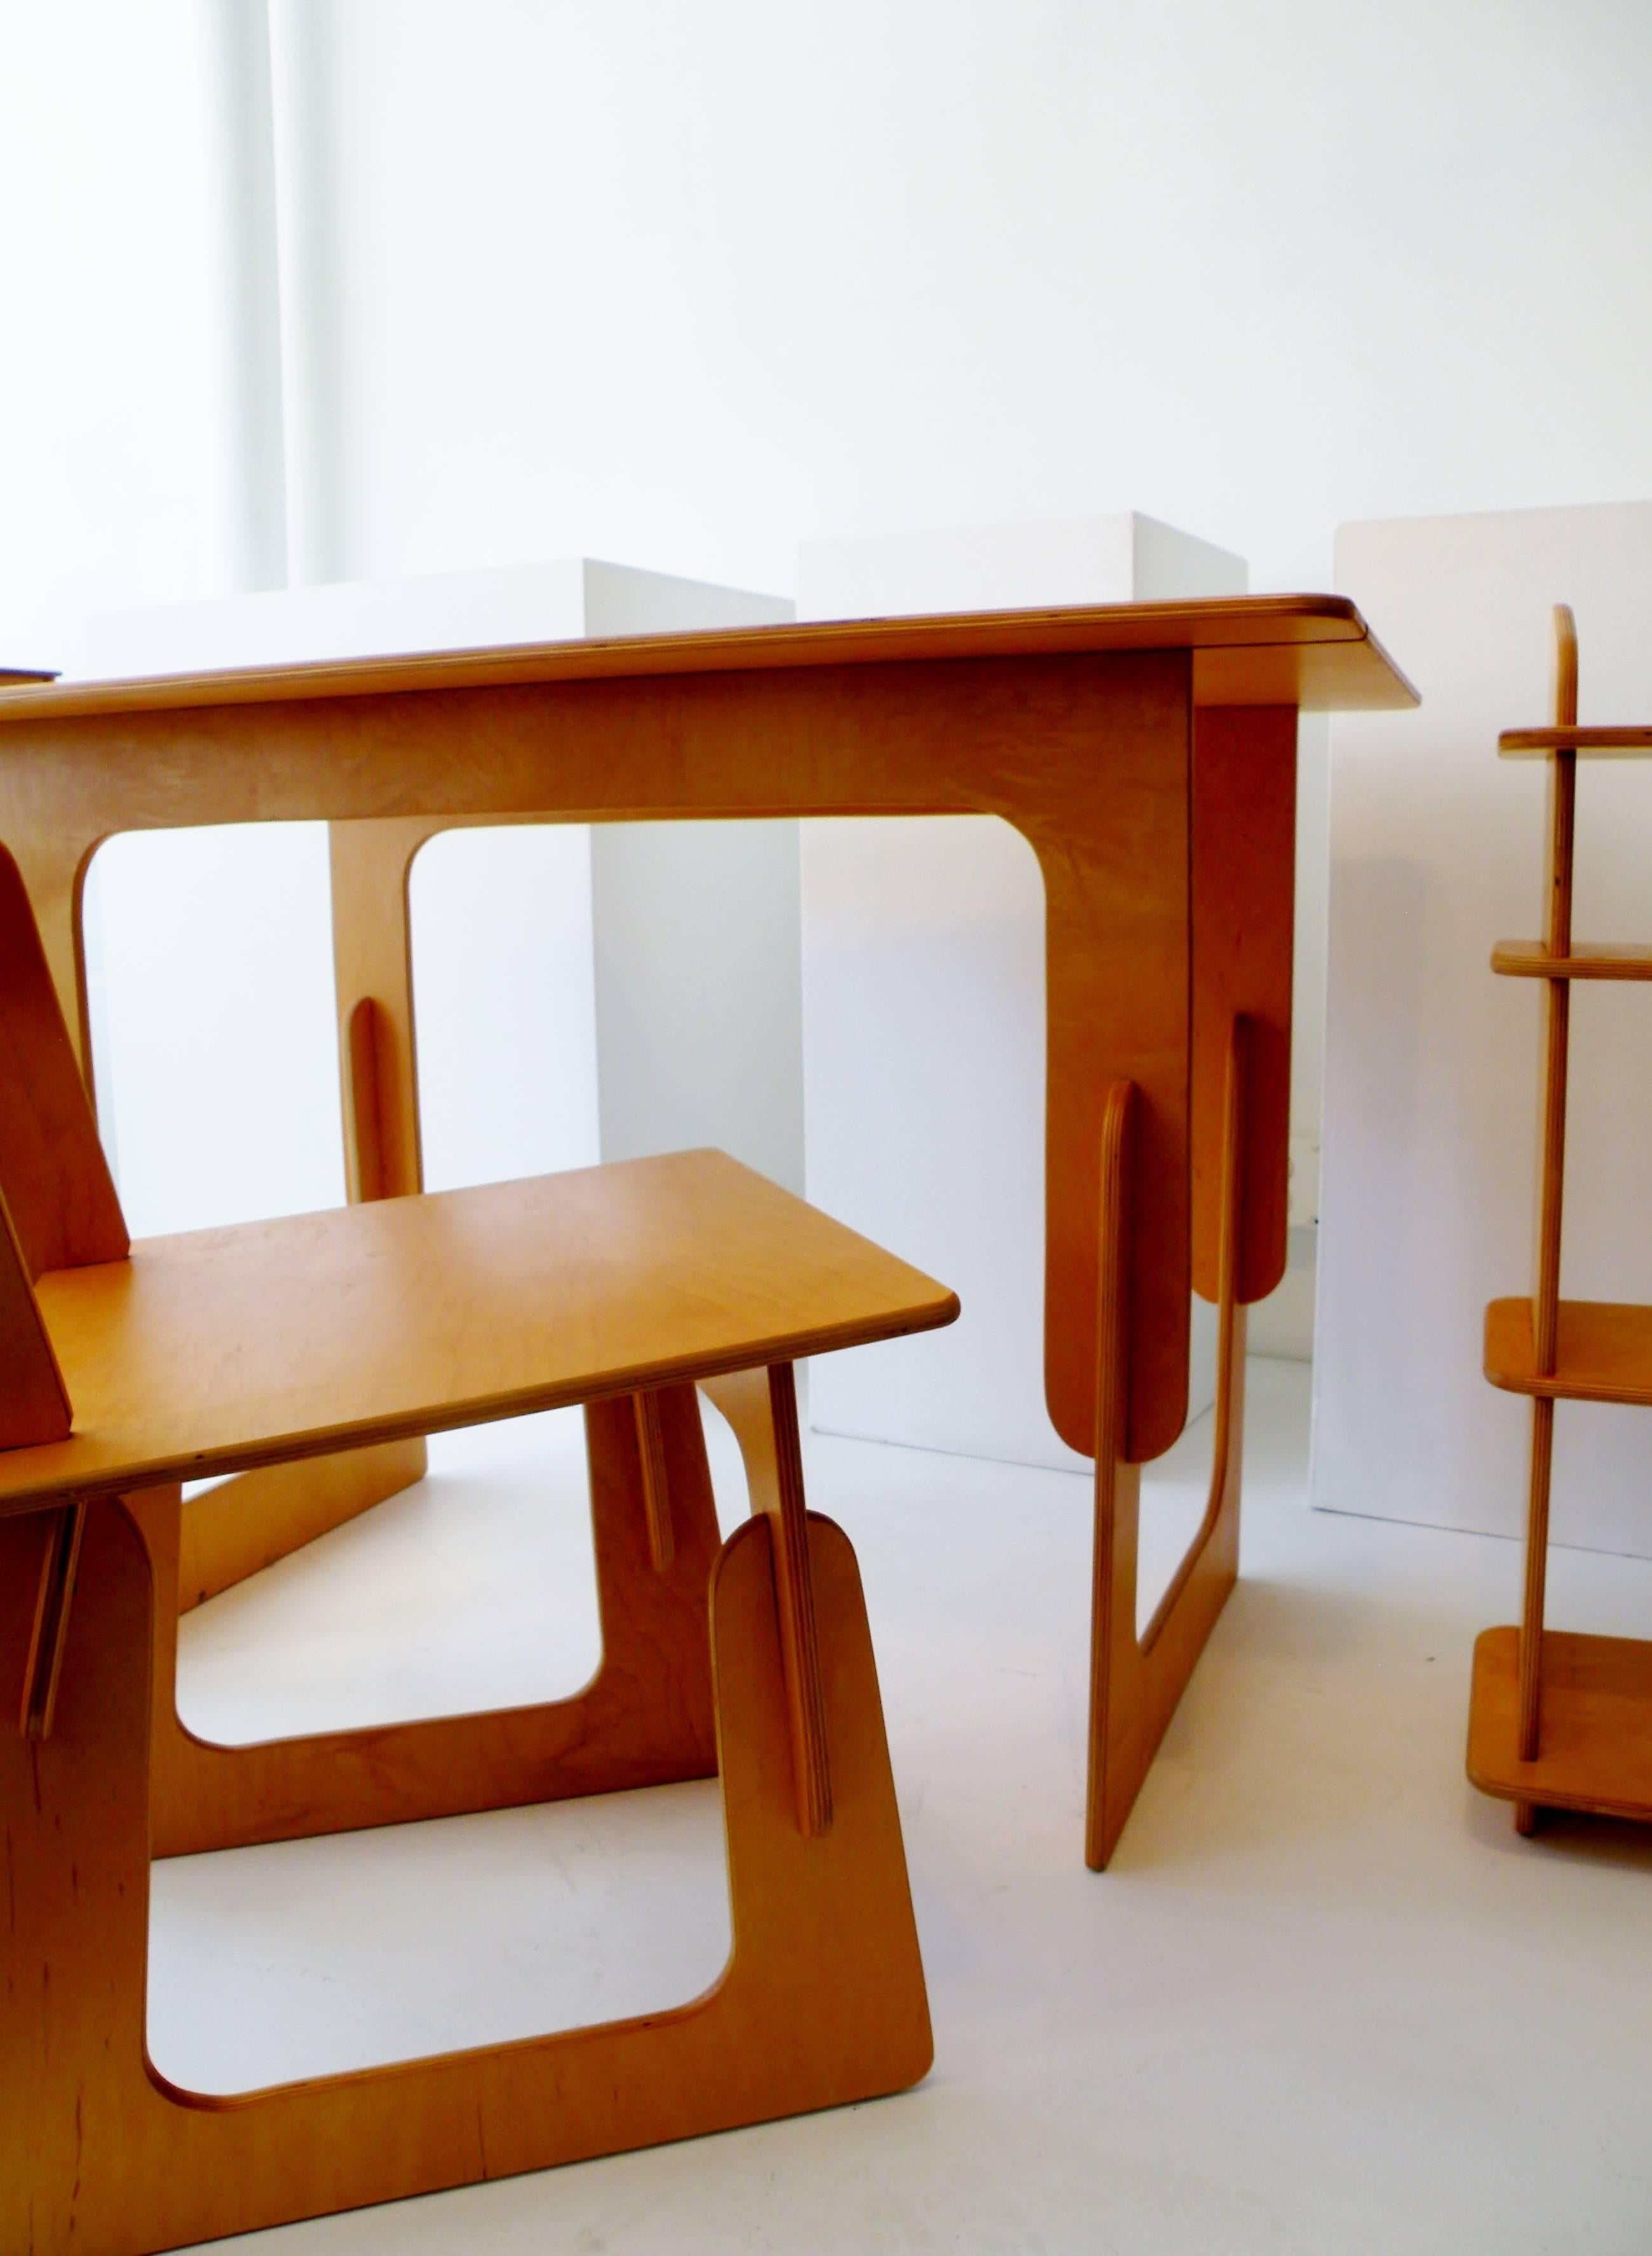 Gentil Organic Modern Post War Knockdown Furniture Co, Plywood Three Piece Office  Desk Set For